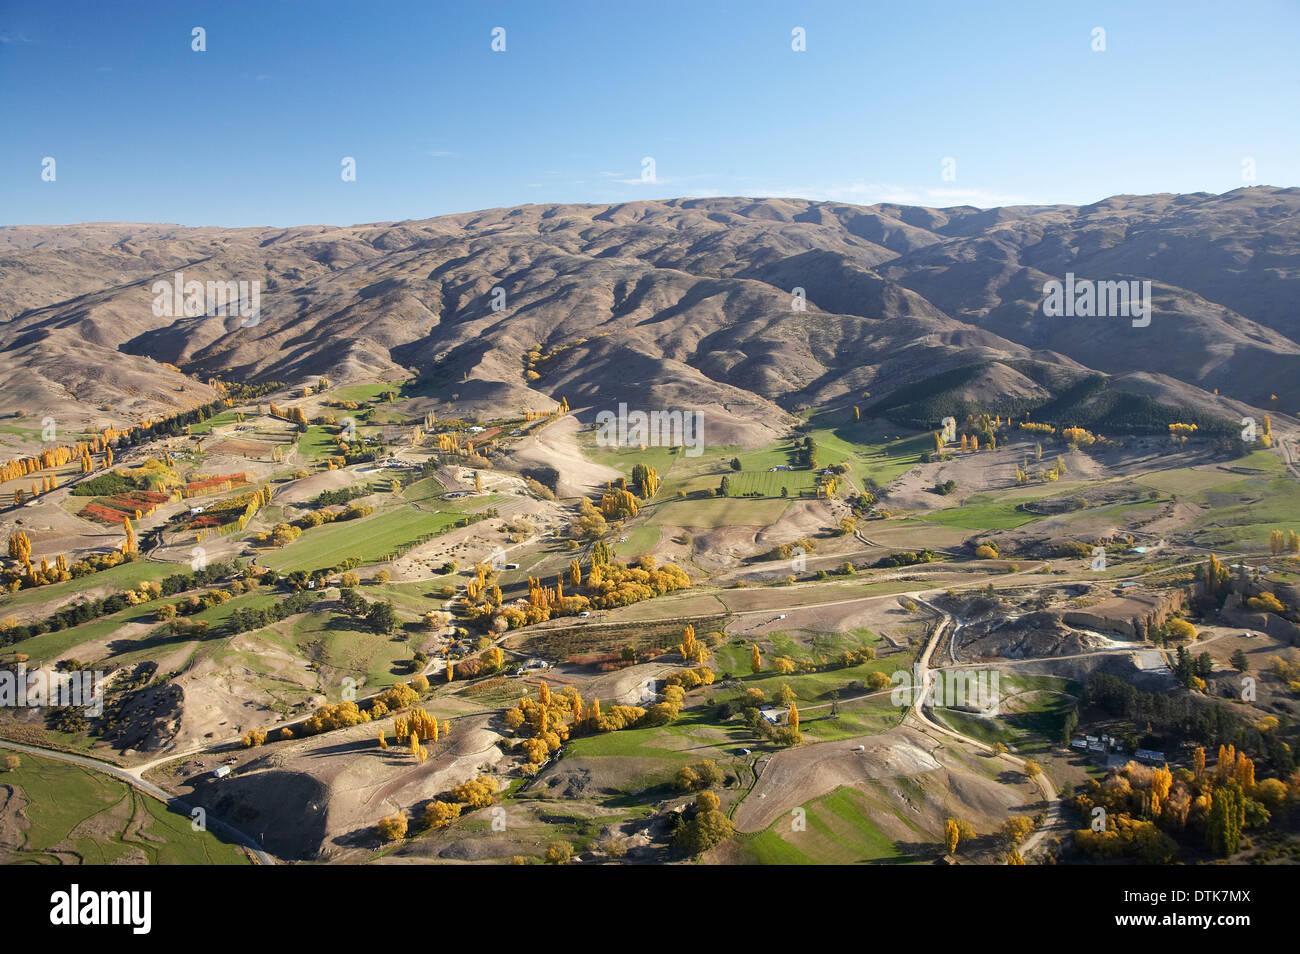 Farms and Carrick Range, Bannockburn, Central Otago, South Island, New Zealand - aerial - Stock Image